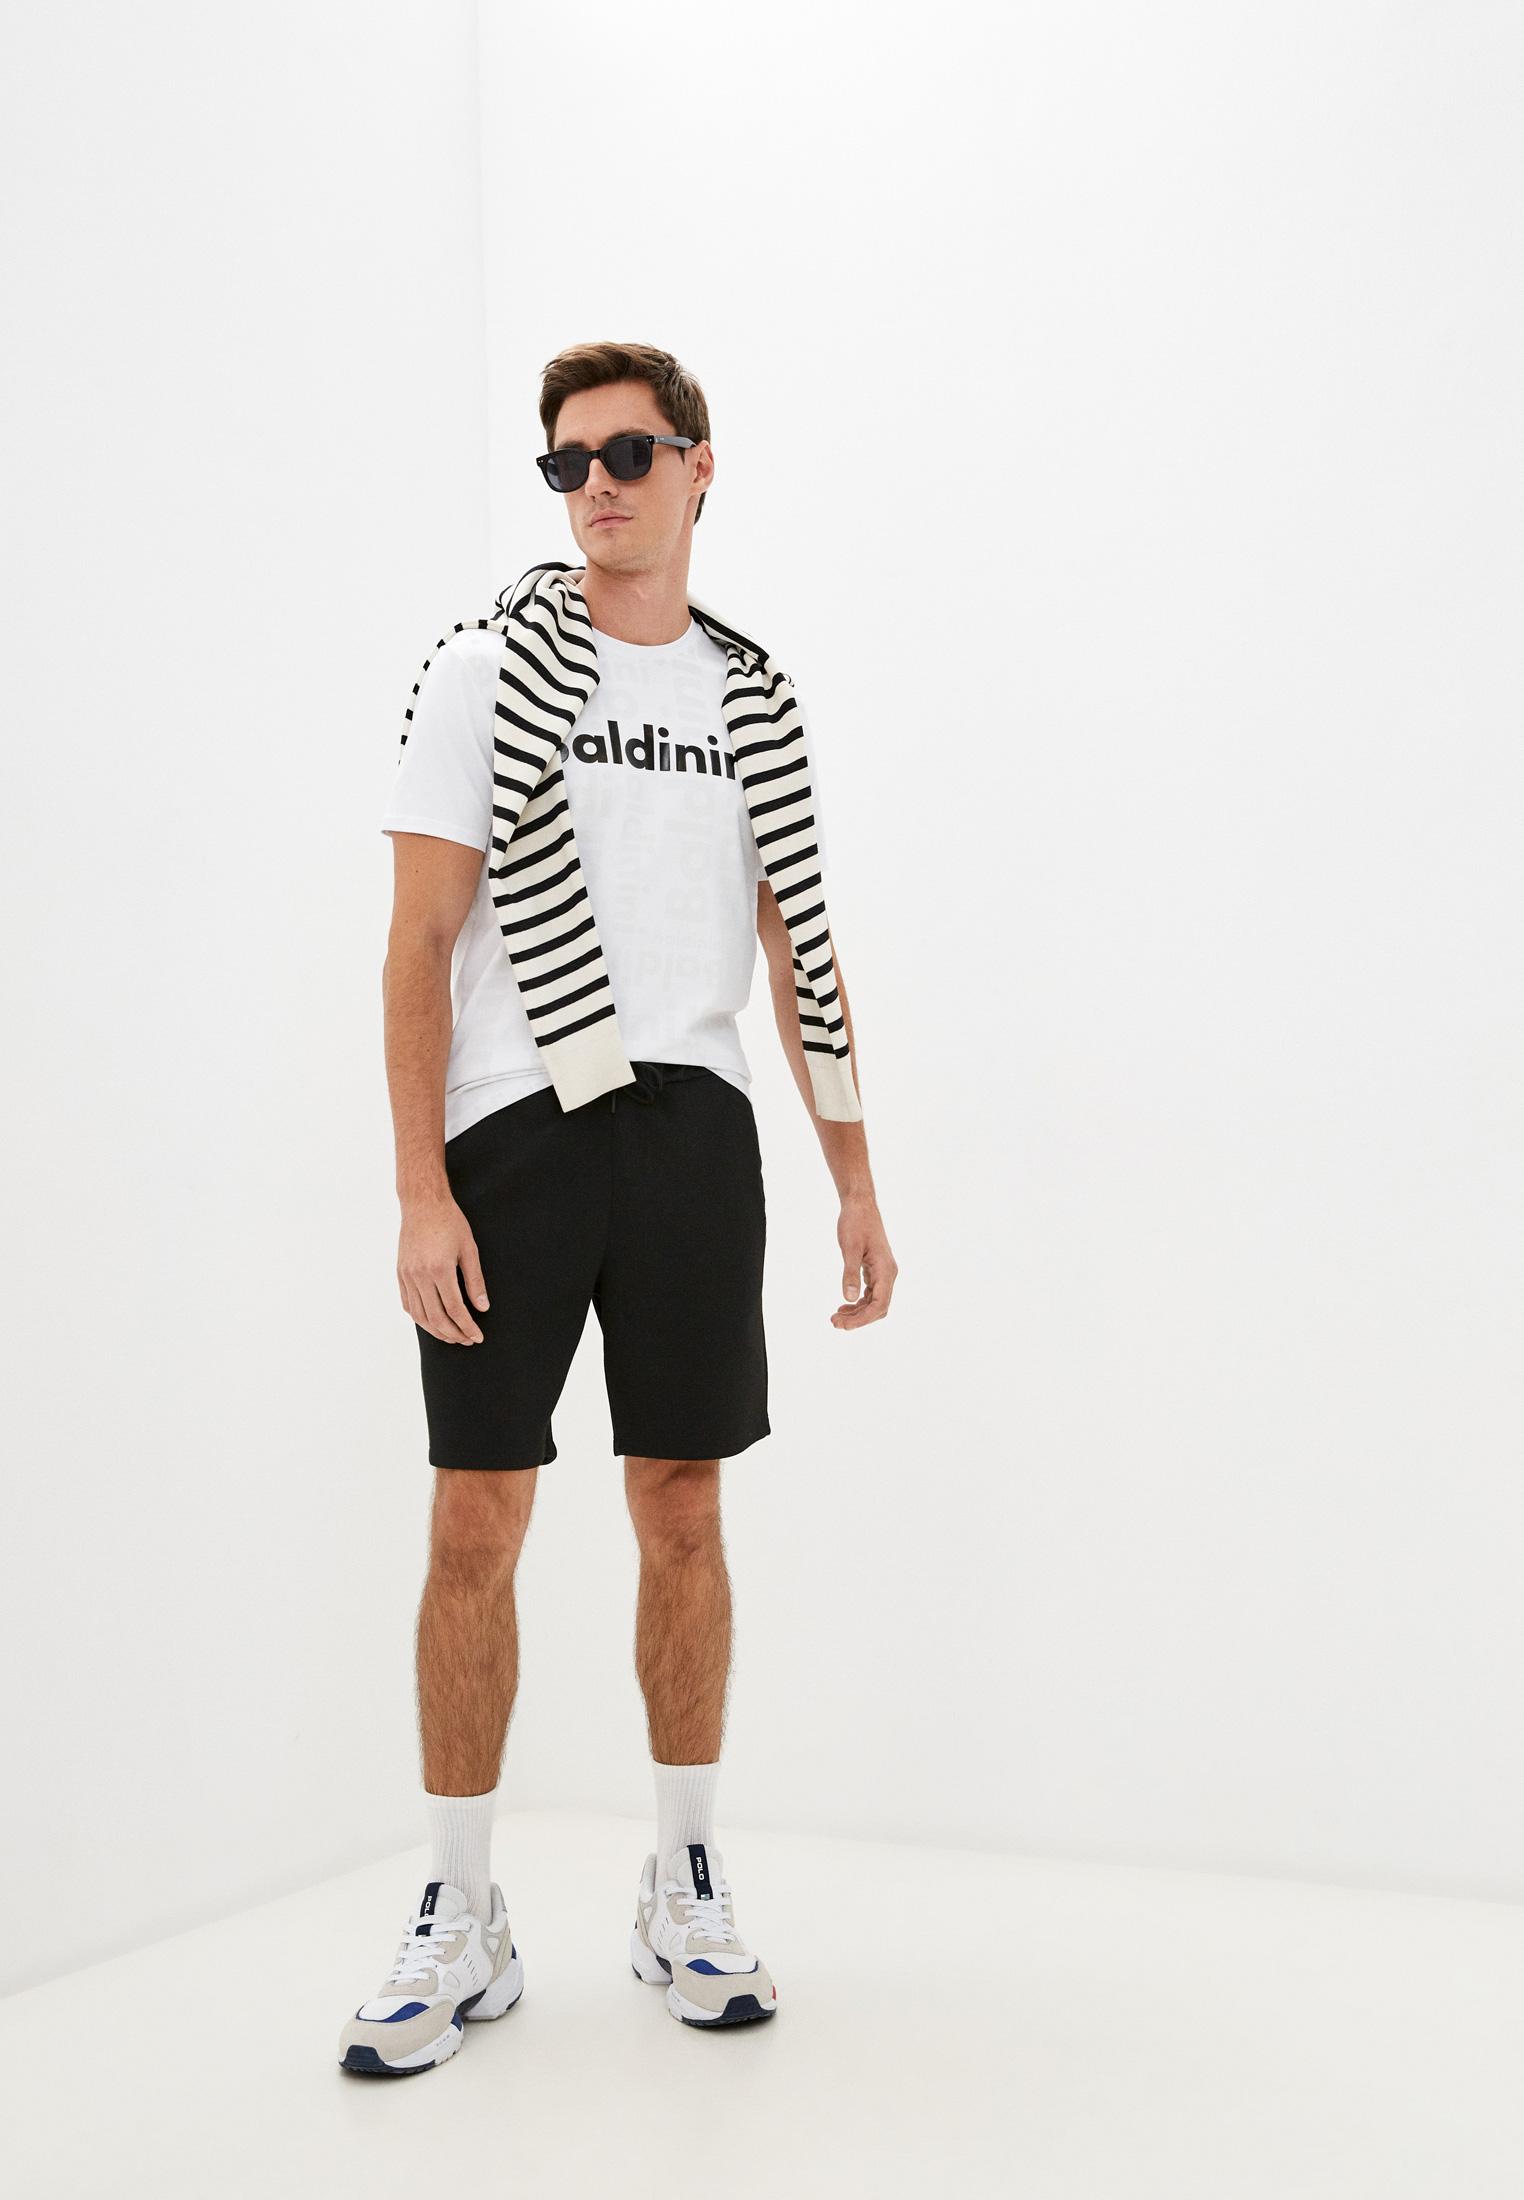 Мужская футболка Baldinini (Балдинини) TSU04: изображение 3